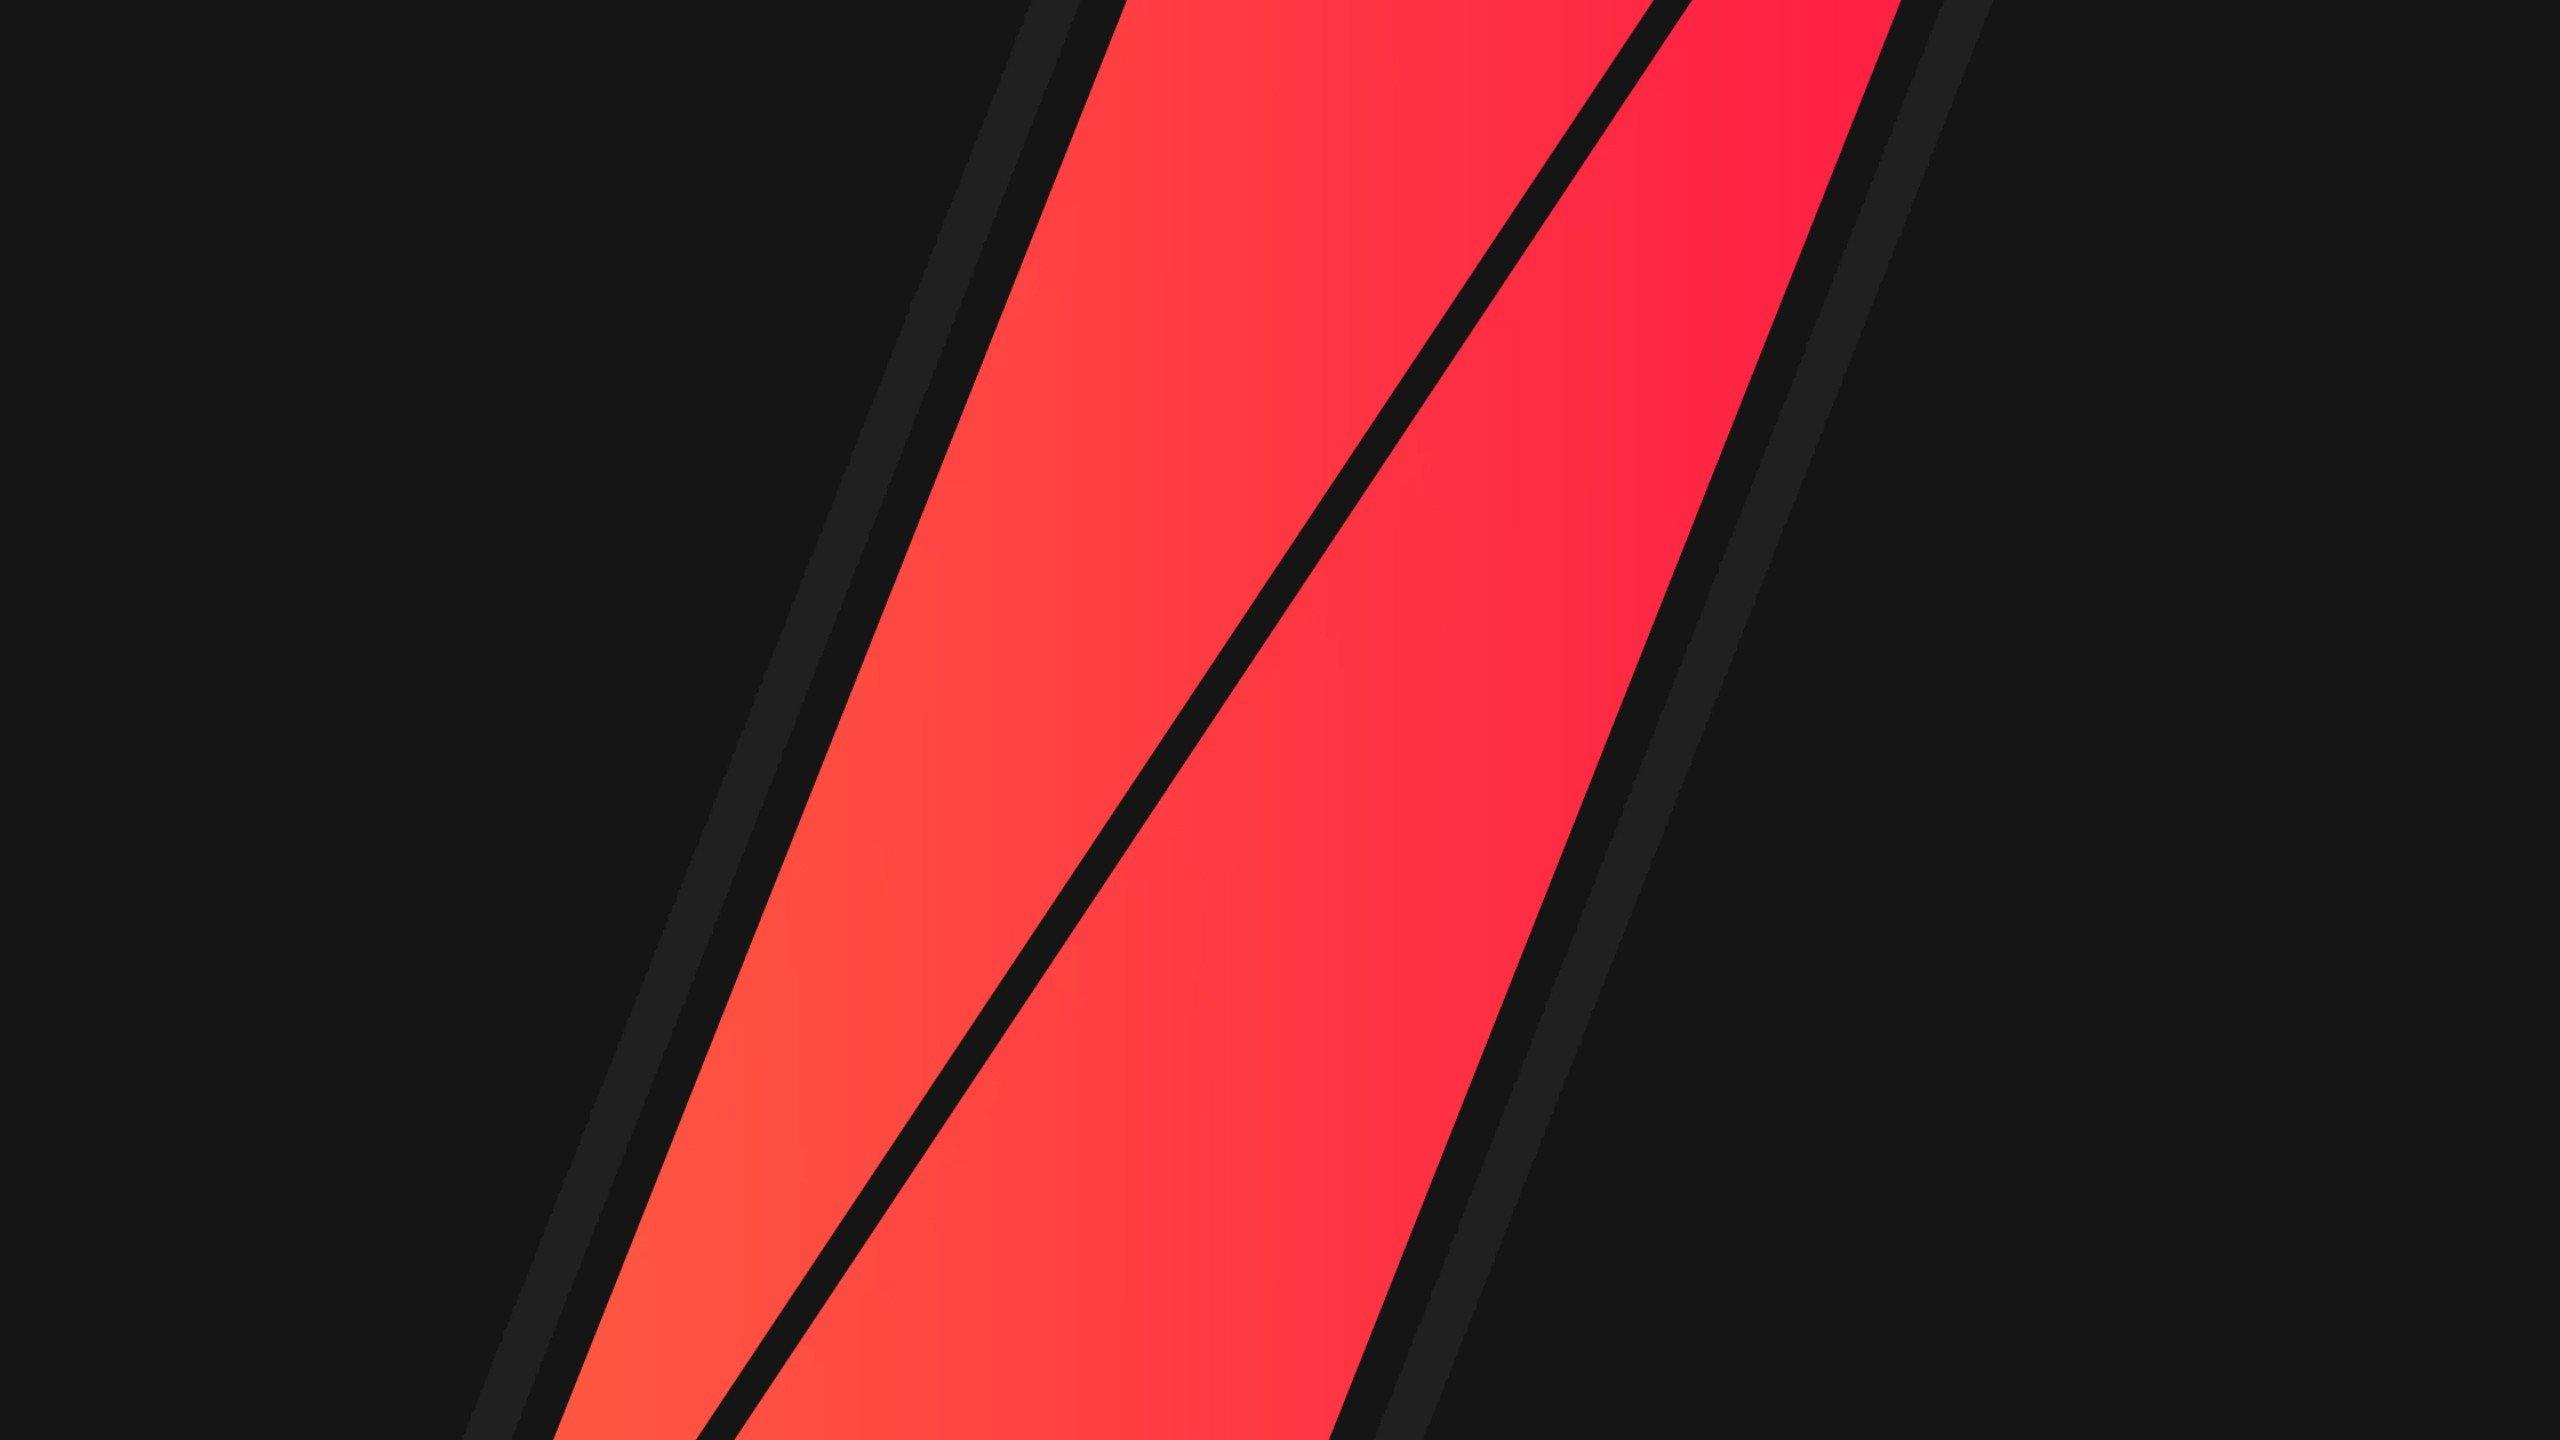 Wallpaper : 2560x1440 px, black, minimalism, red, vector ...